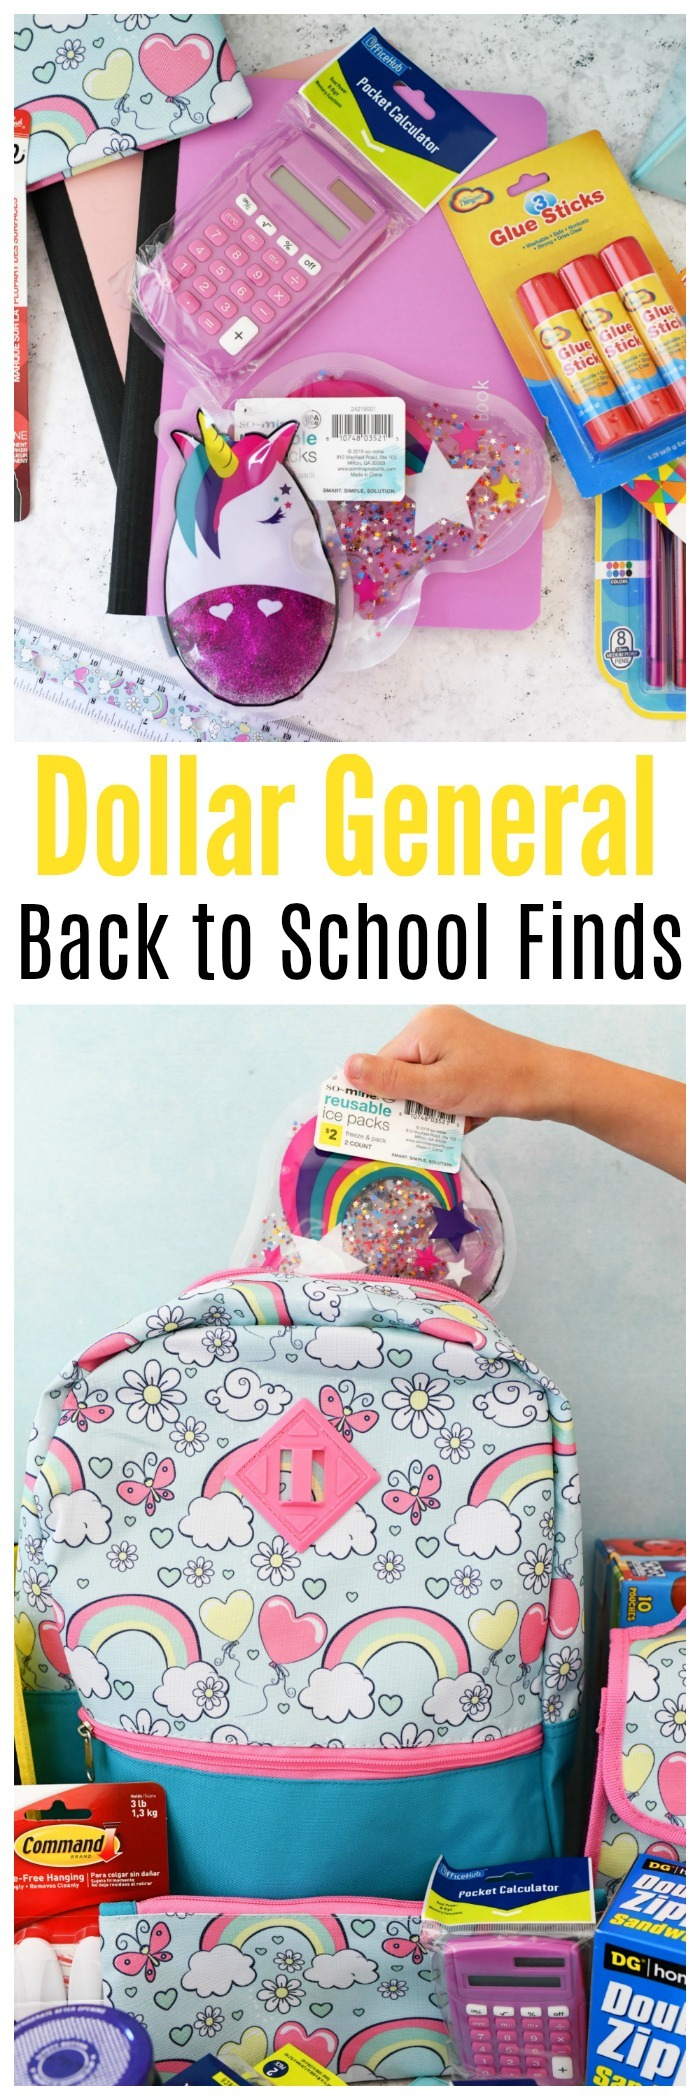 Dollar General Coupons & Savings (Back to School)